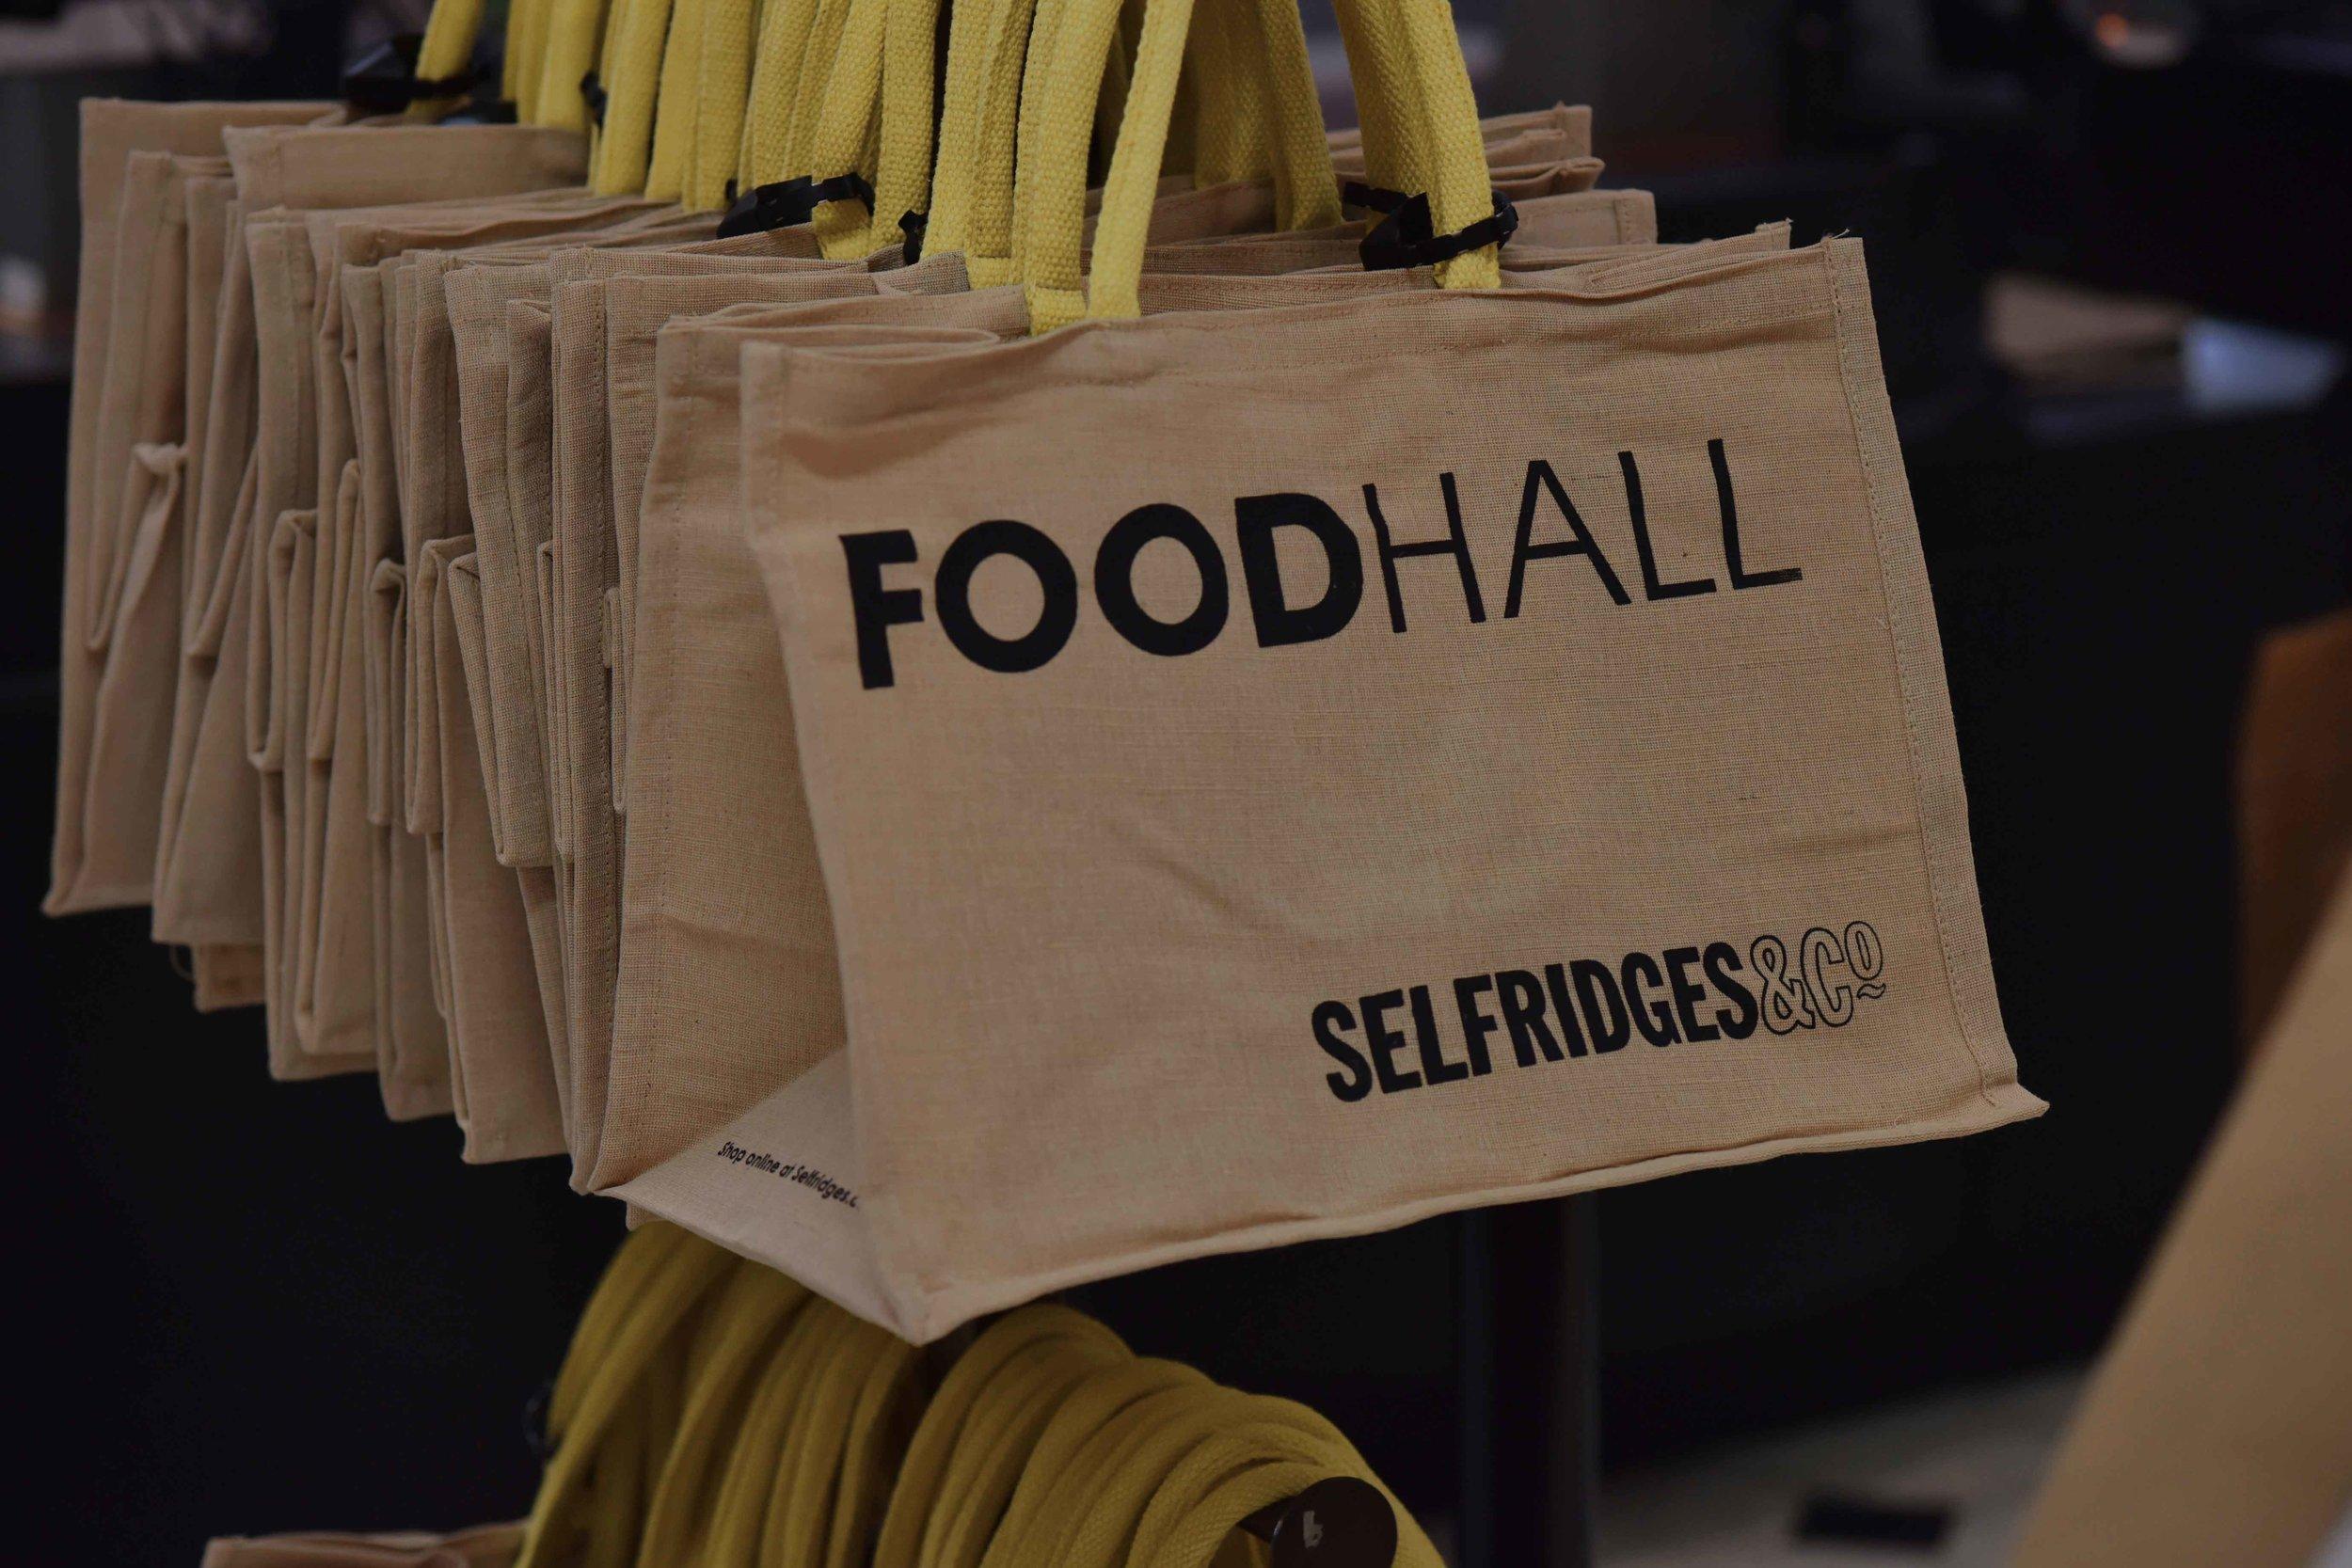 Foodhall, Selfridges, London, U.K. Image©sourcingstyle.com